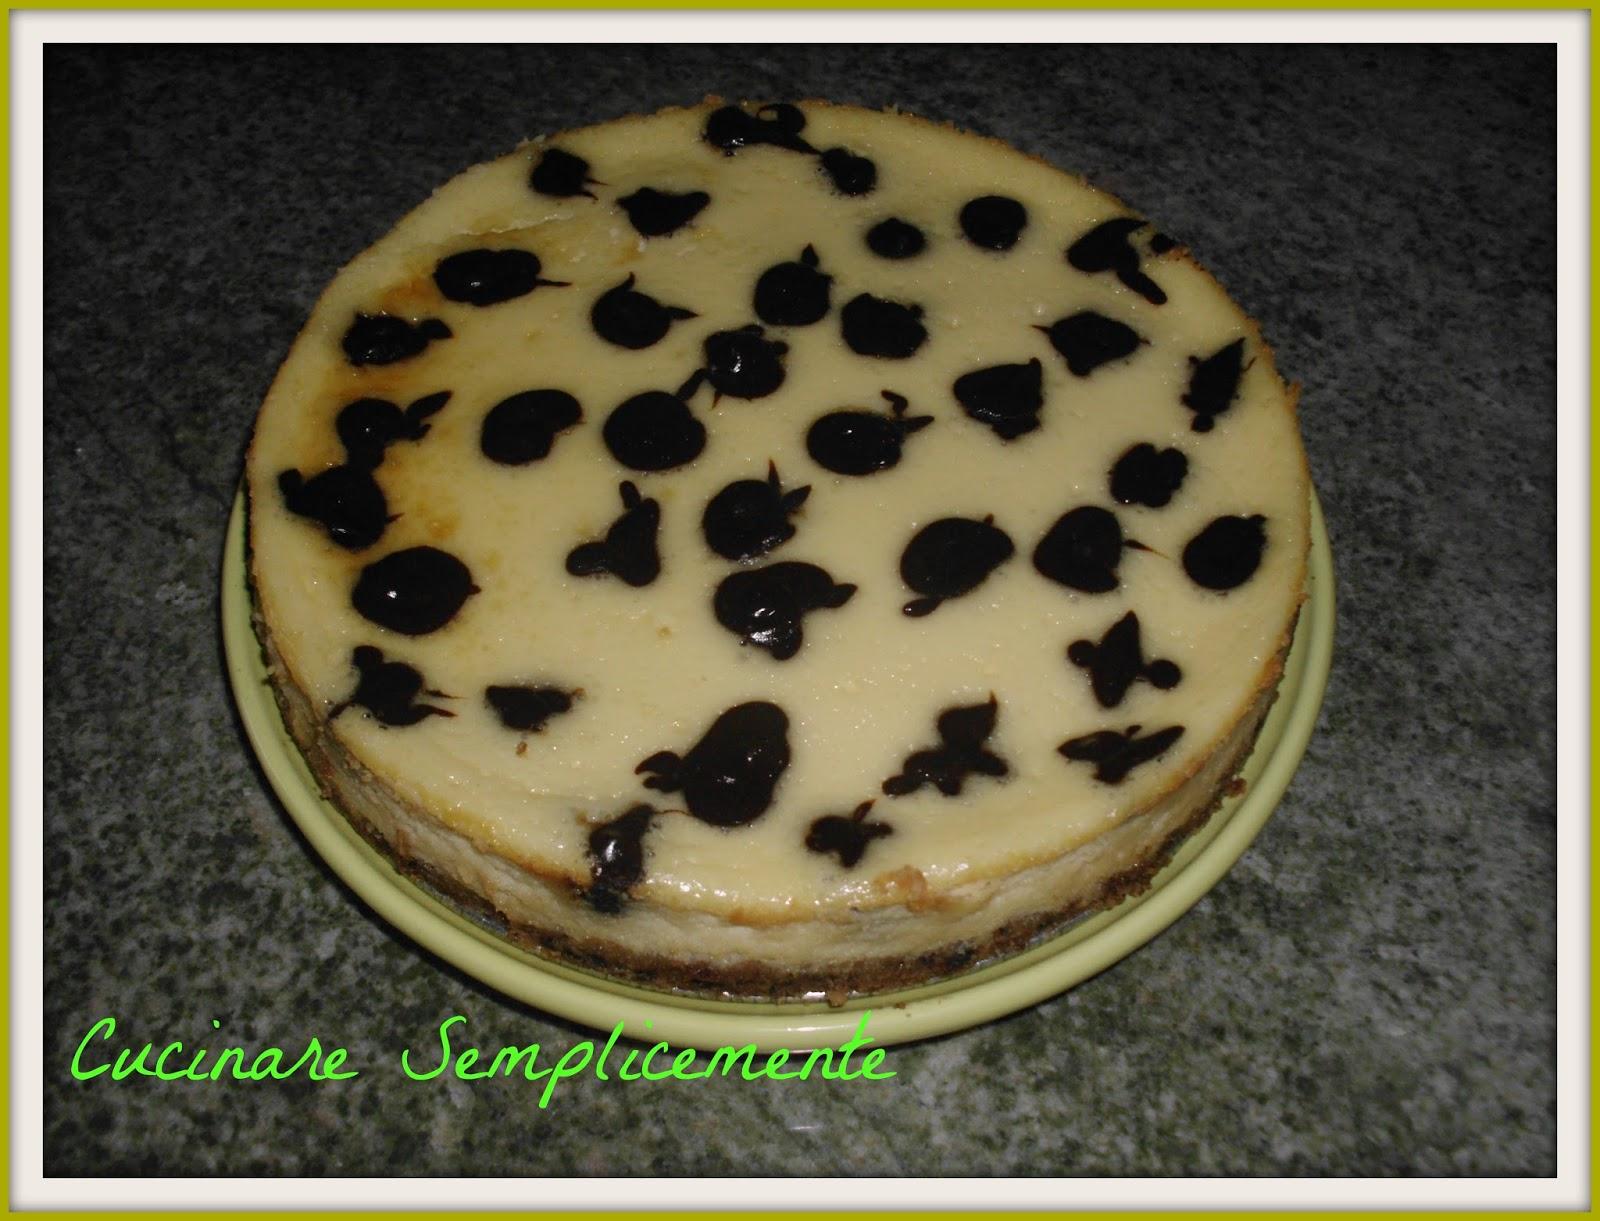 Cucinare semplicemente polka dot cheesecake for Cucinare e congelare